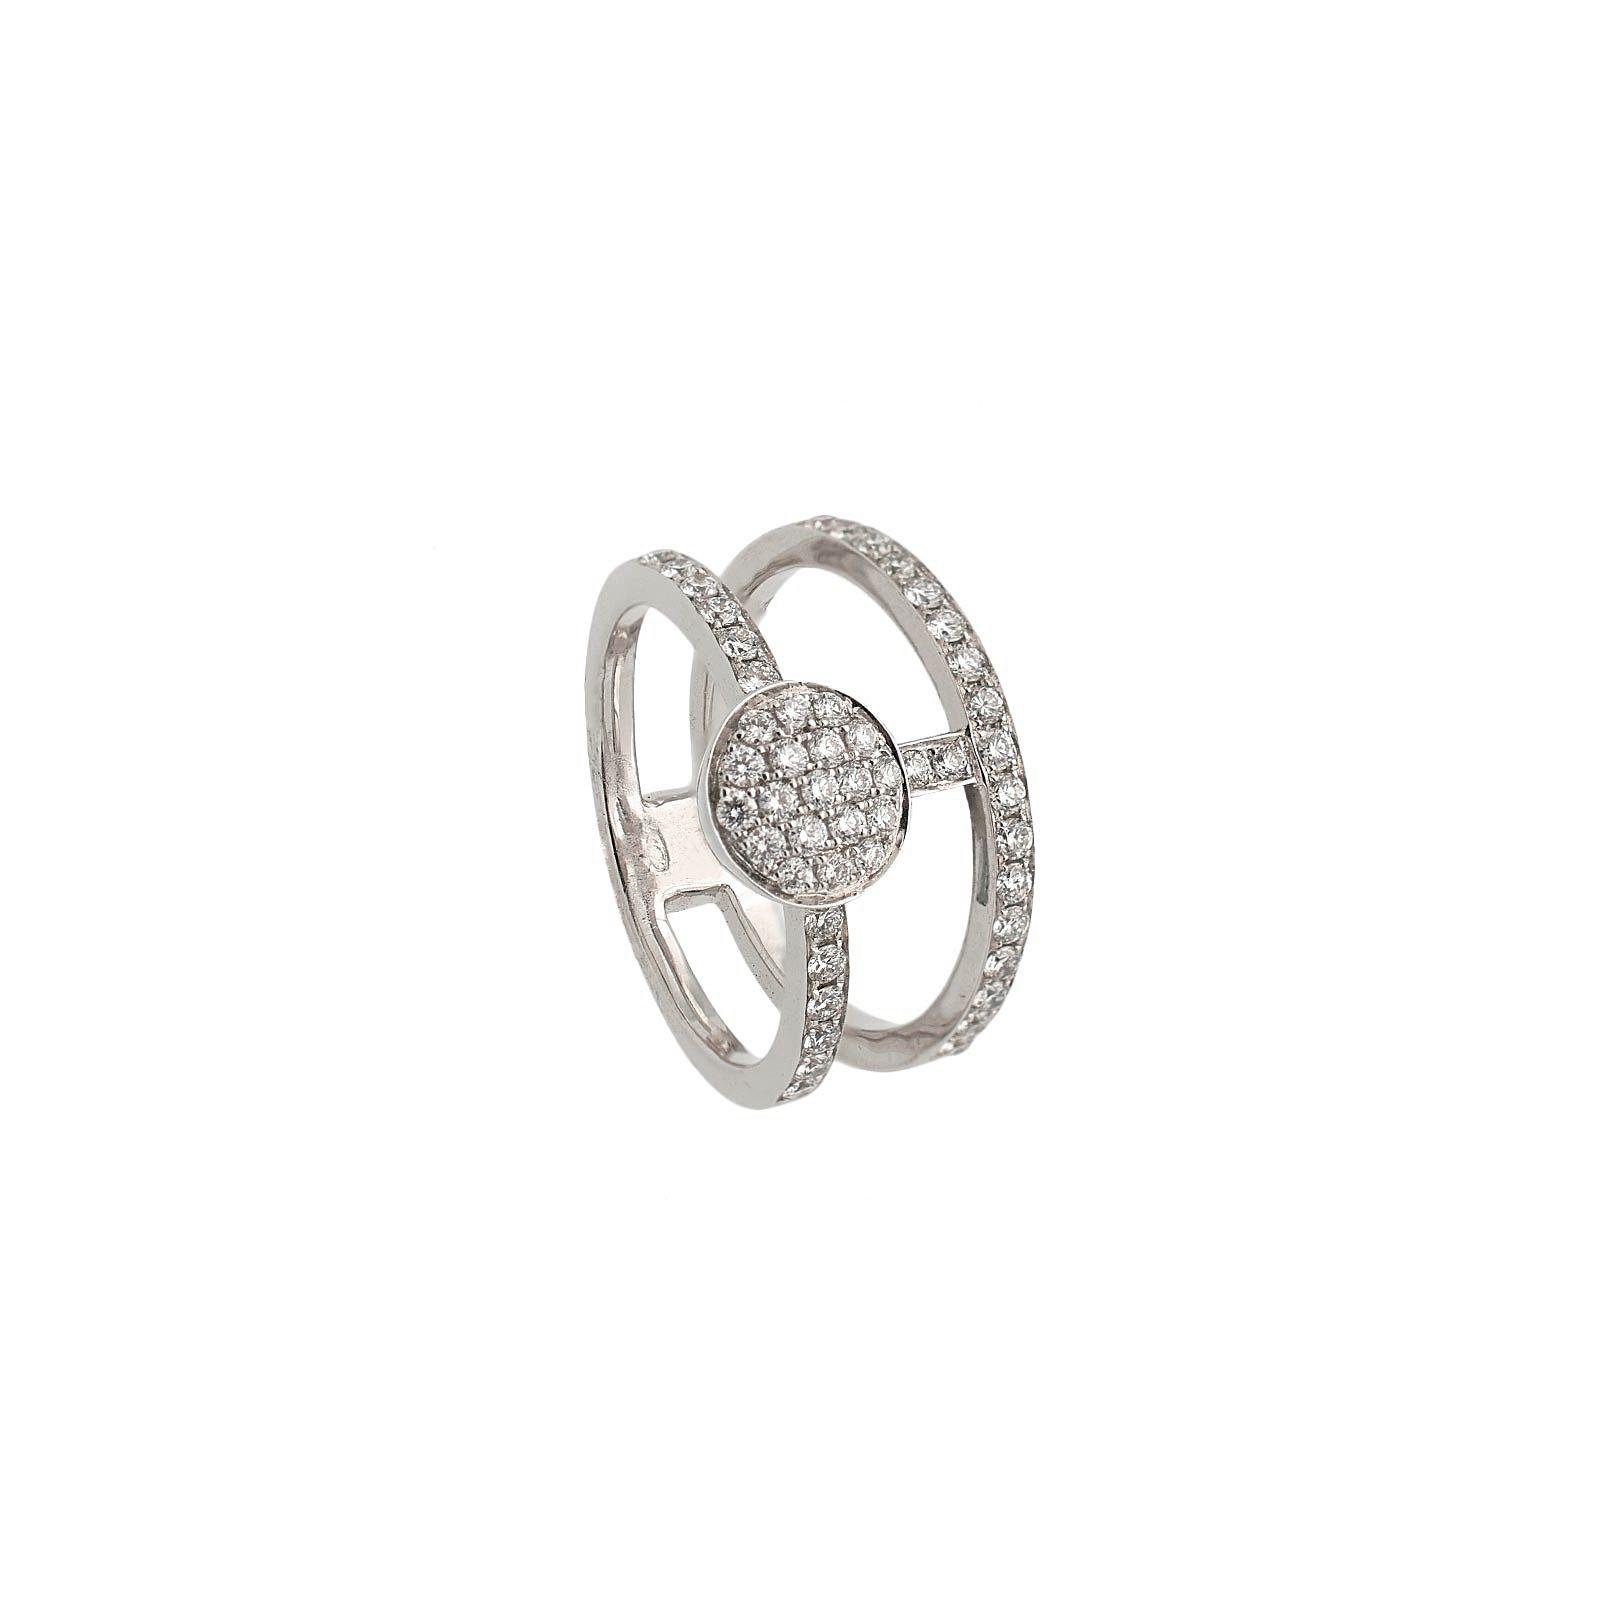 Sortija de oro blanco y diamantes en doble anillo  - 1